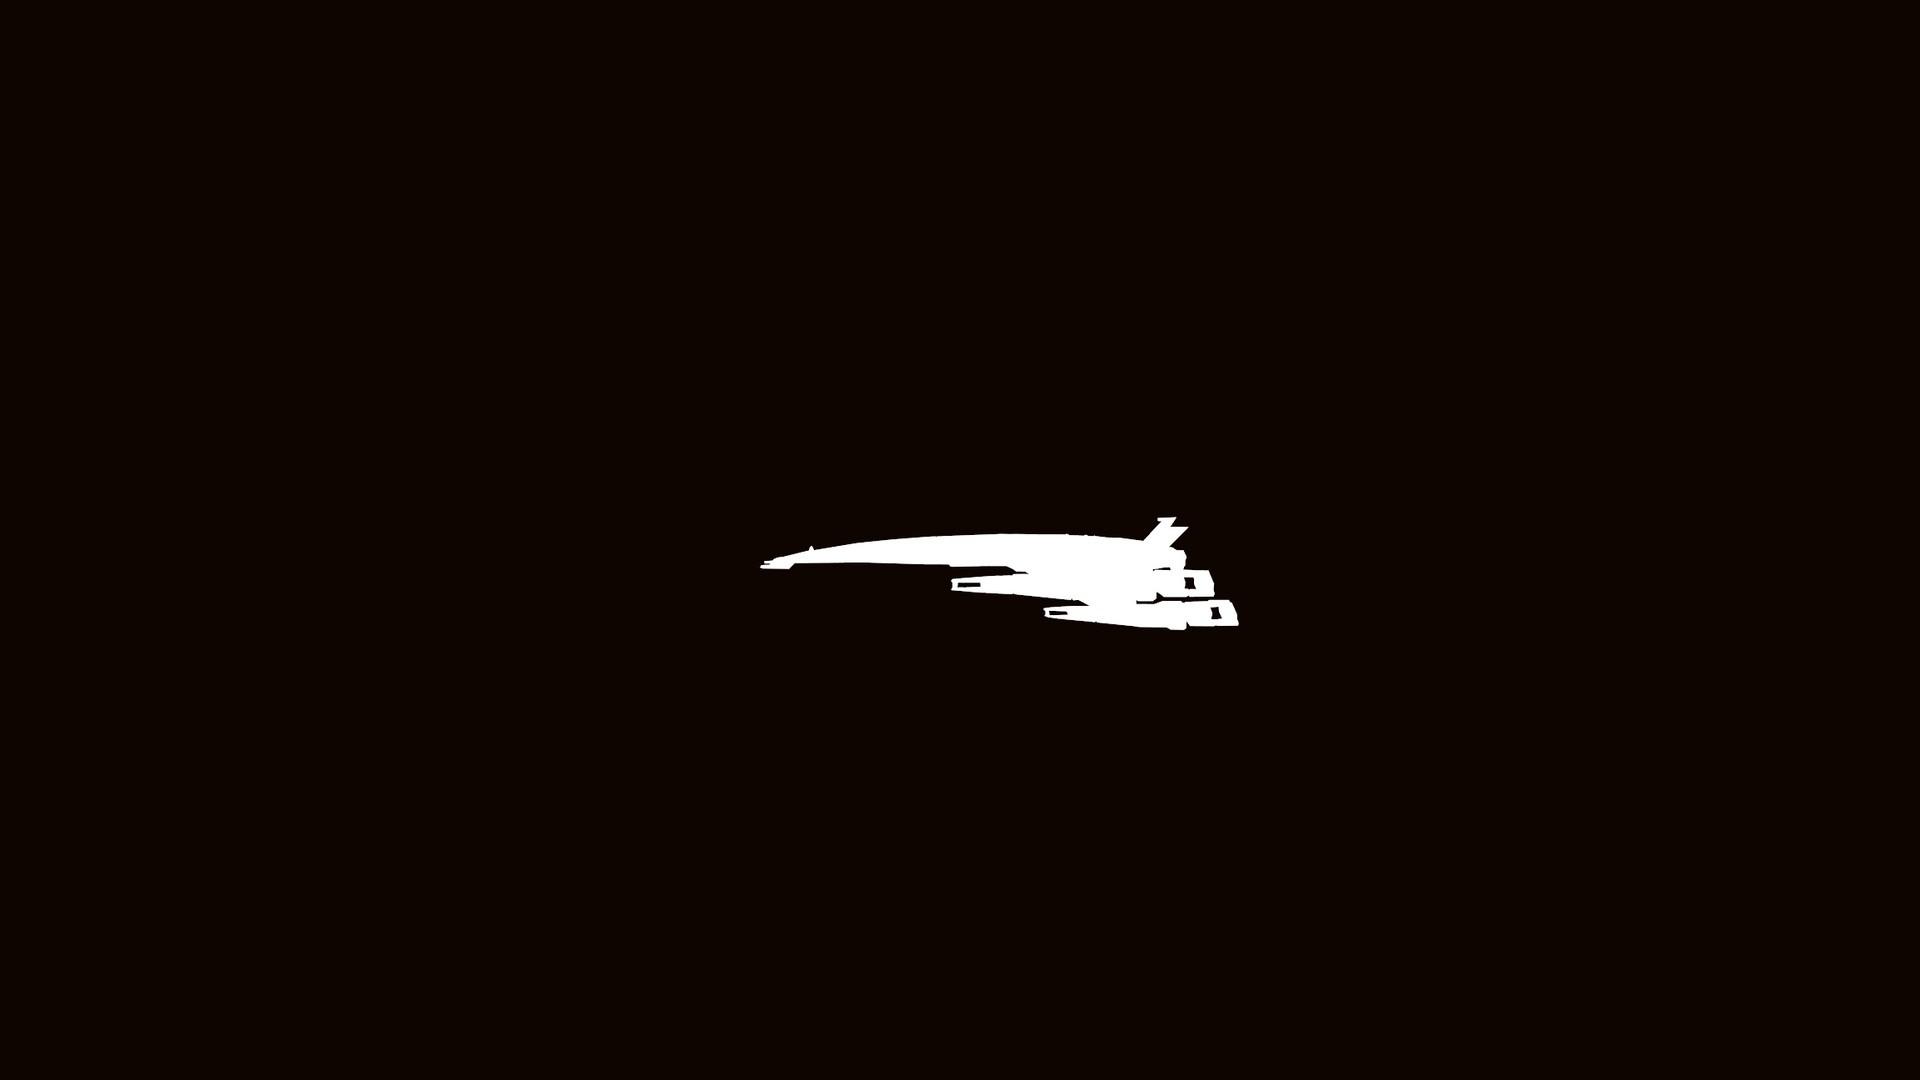 Mass Effect minimalism vehicle dark background airplane aircraft logo simple darkness wing 2 screenshot 1920x1080 px